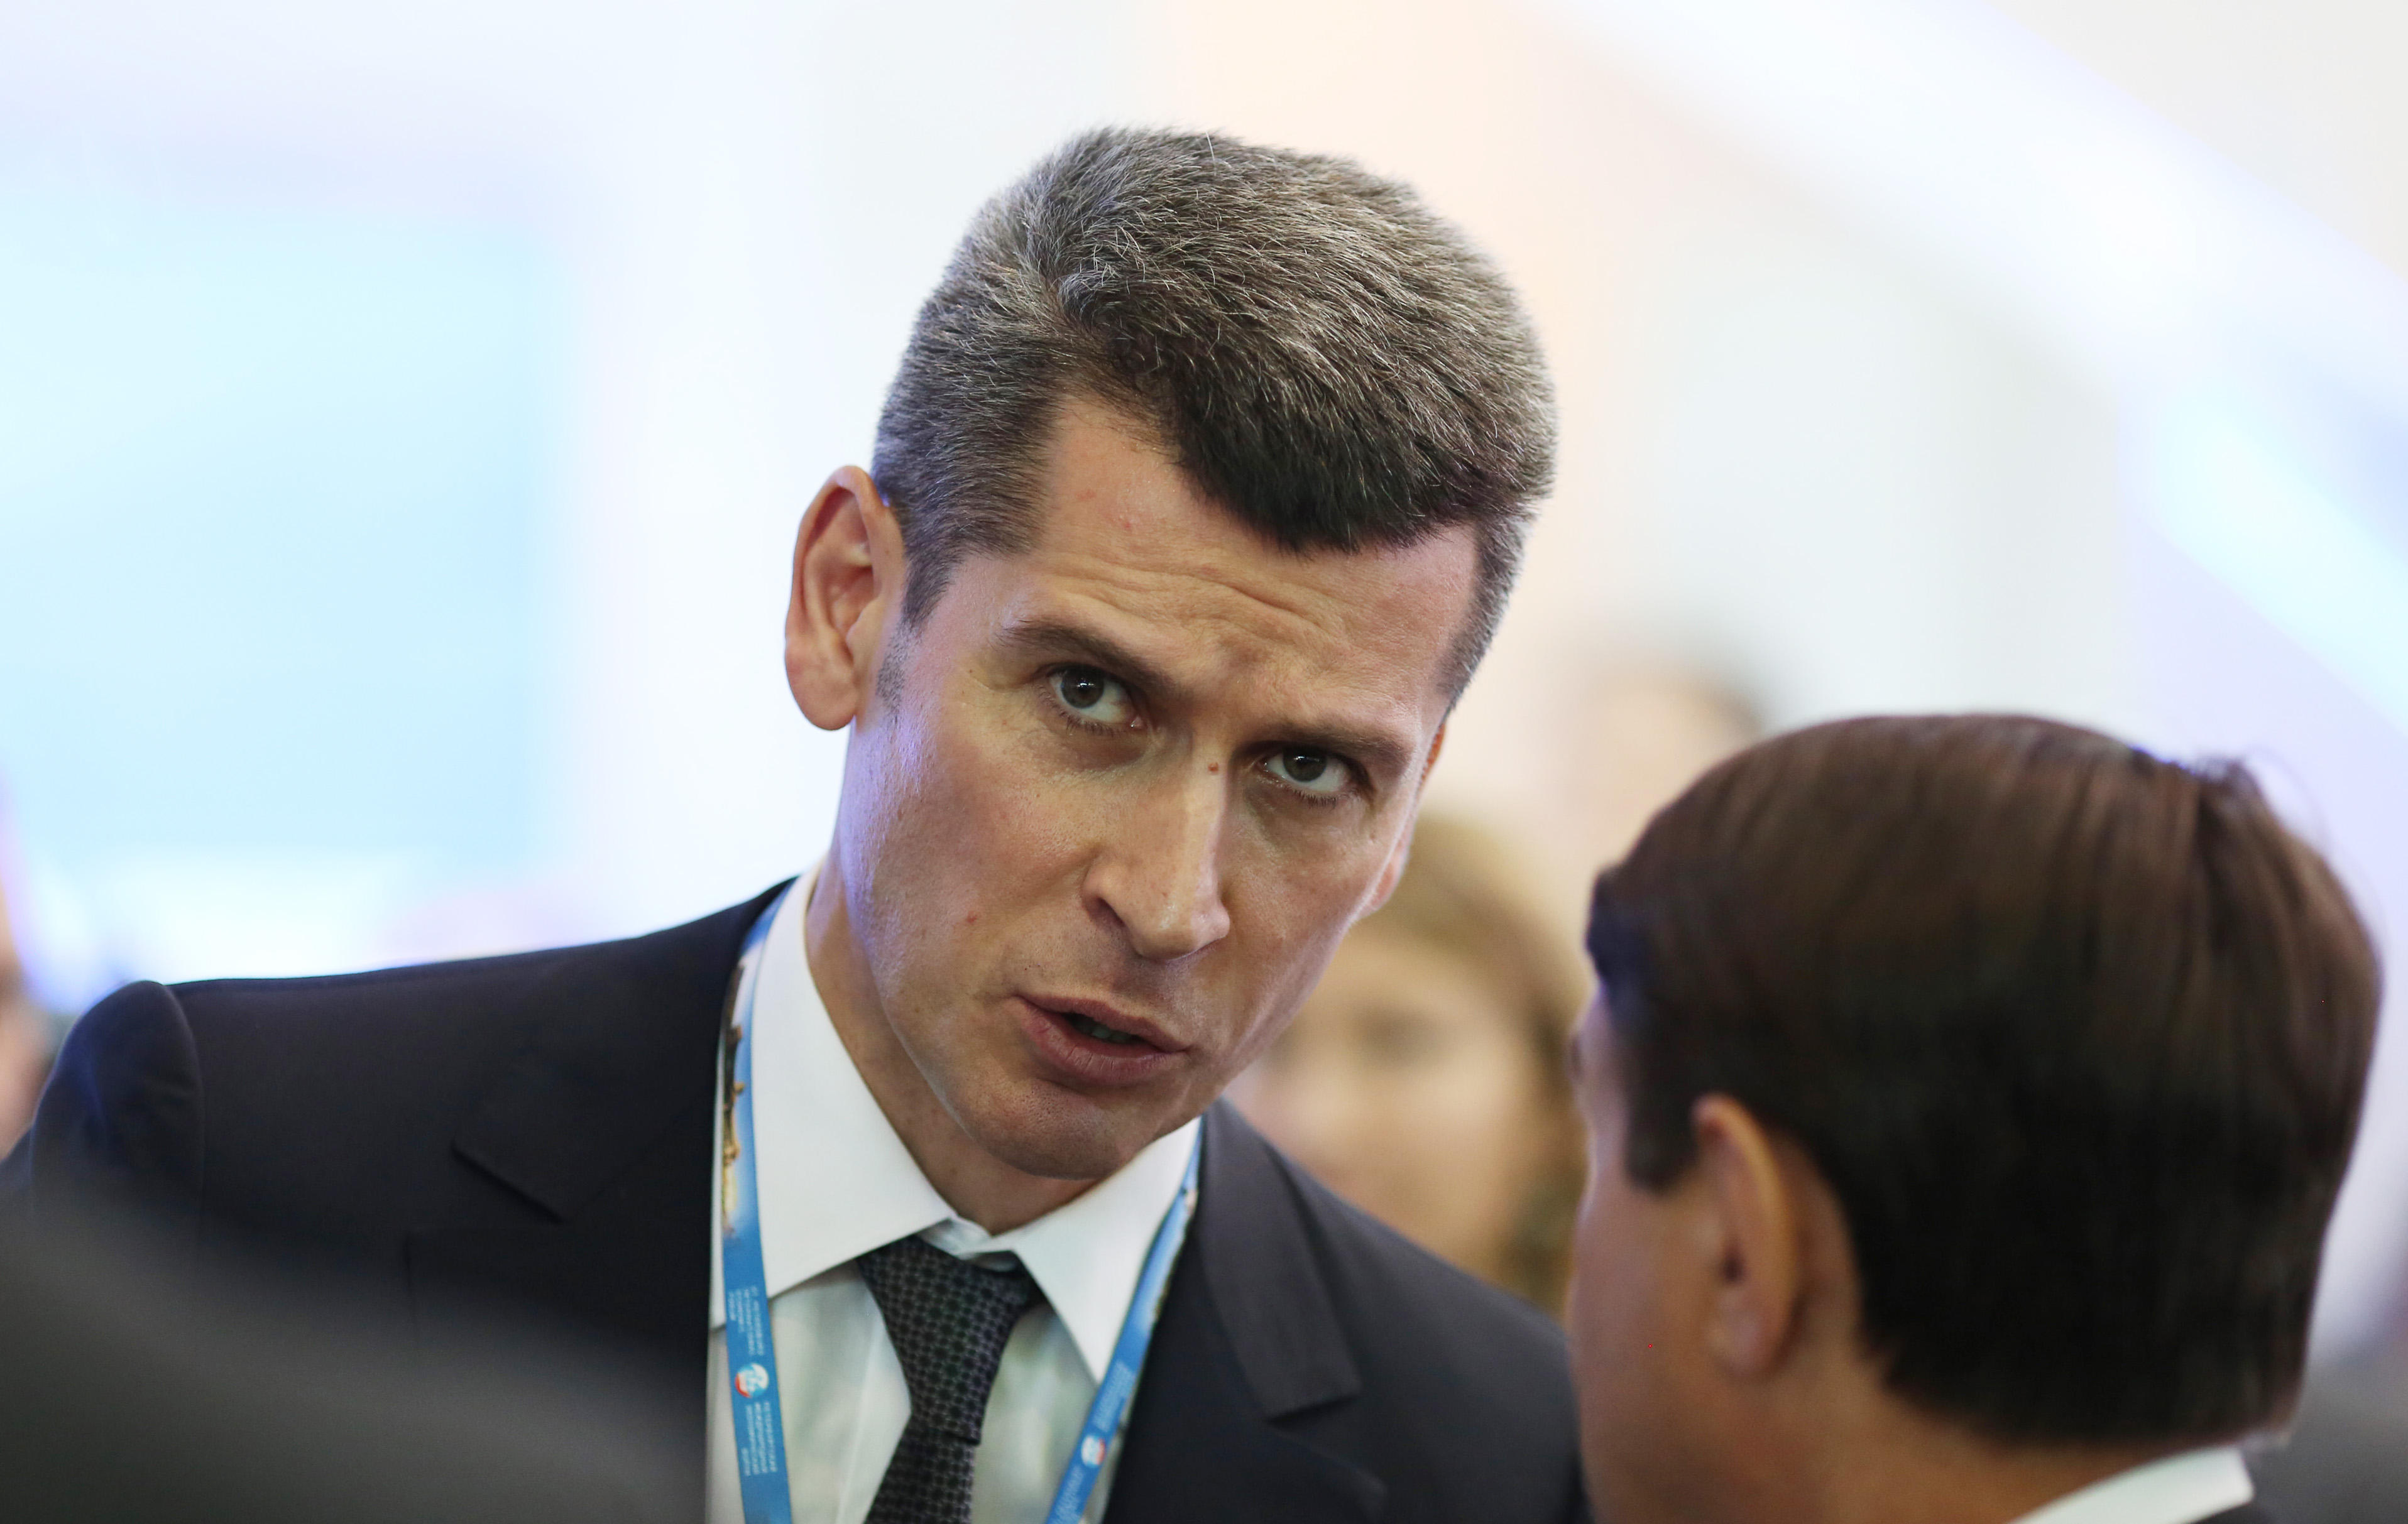 Day Two Of The Saint Petersburg International Economic Forum 2015